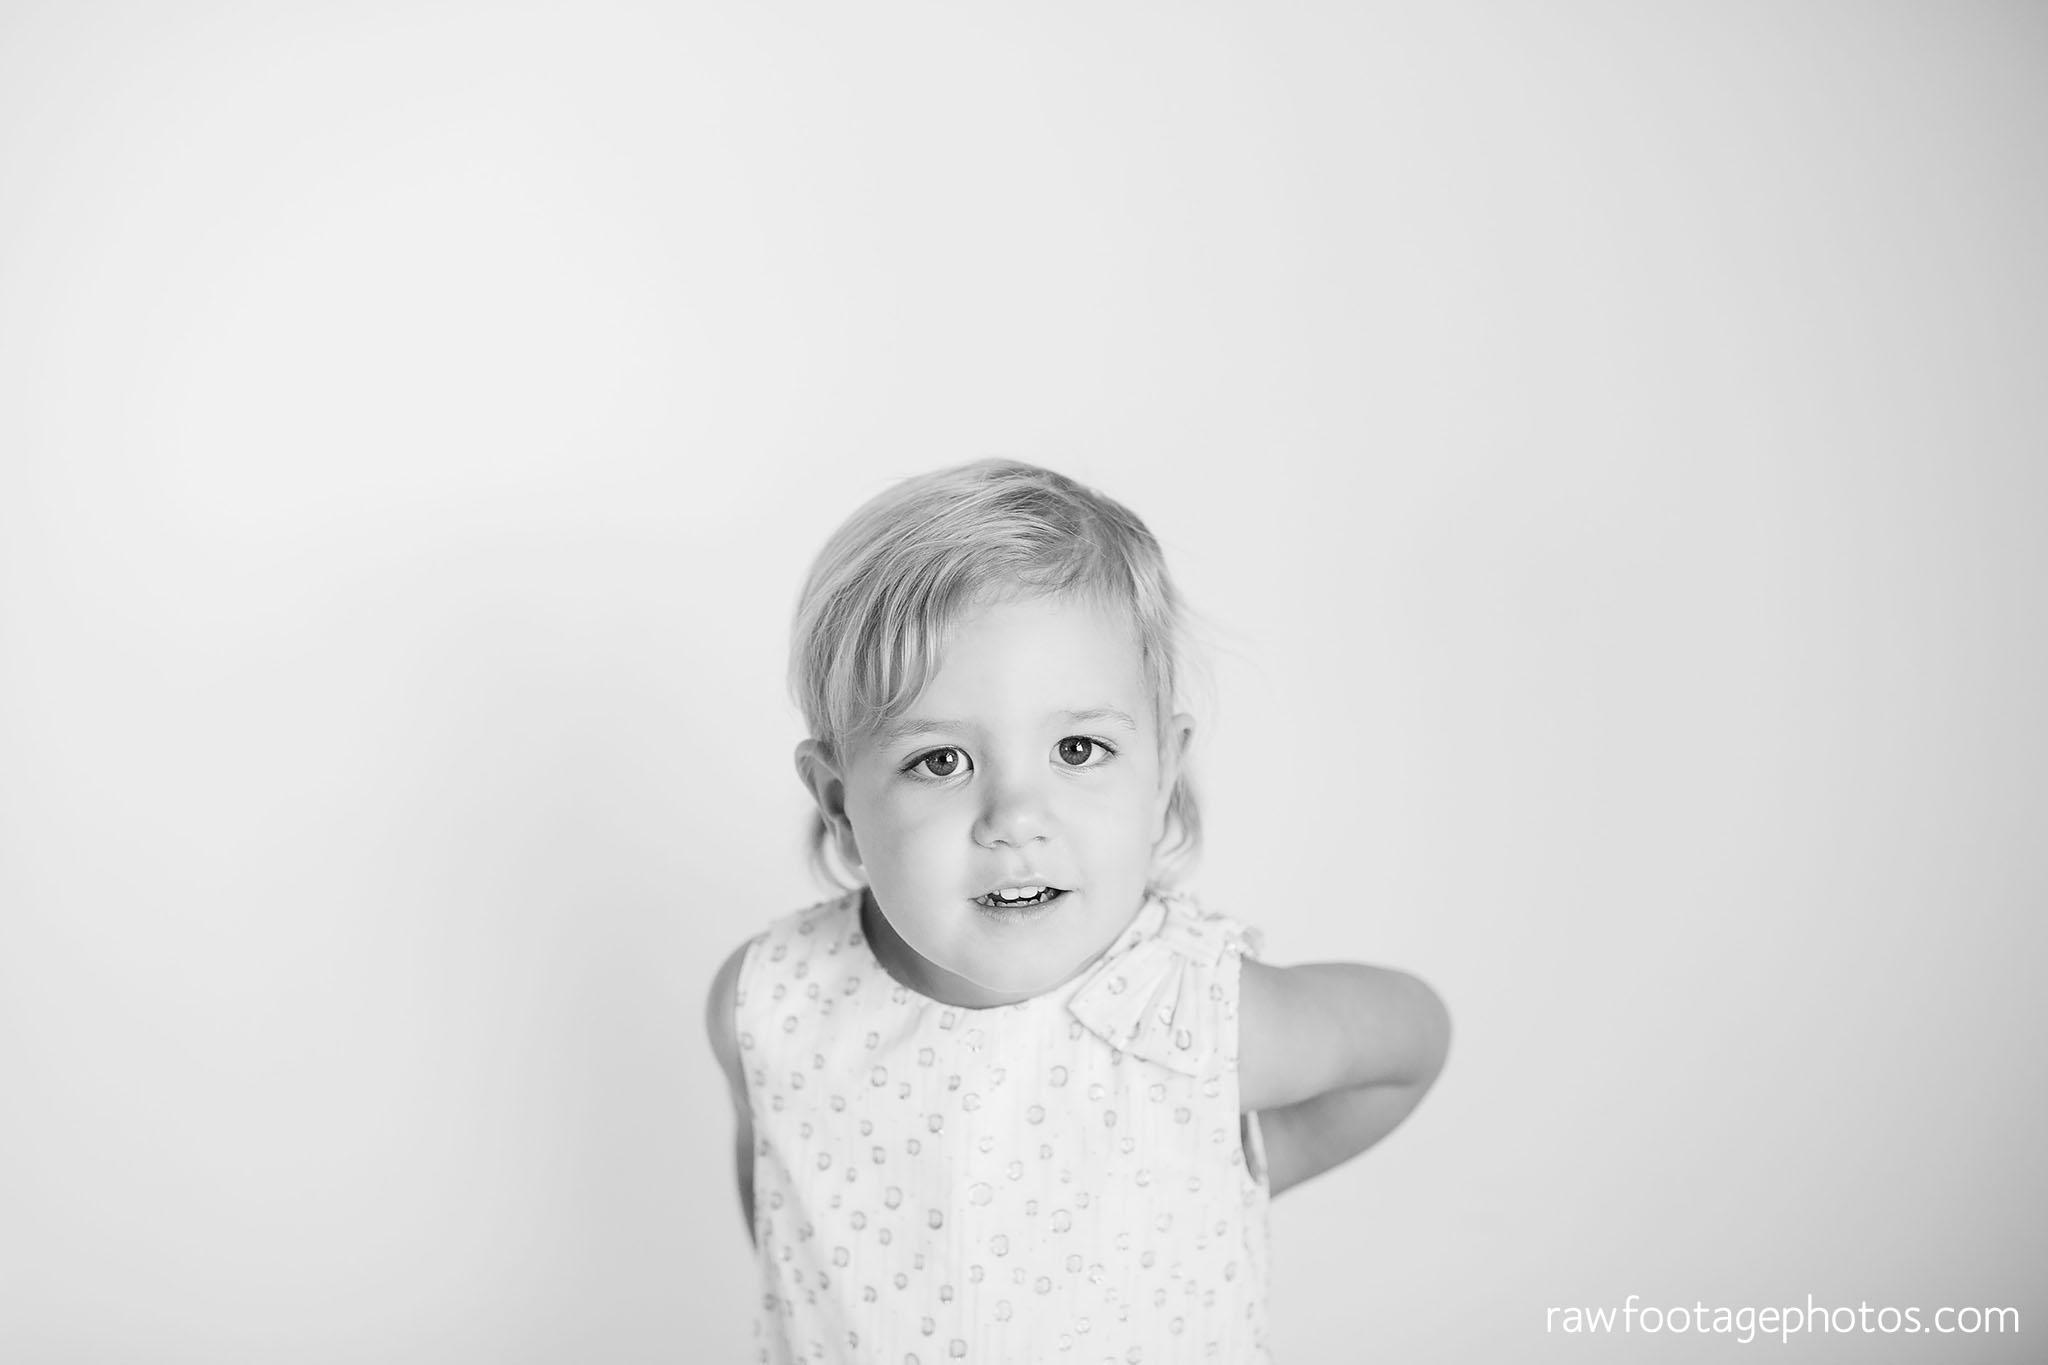 london_ontario_family_photographer-studio_photography-studio_lifestyle_portraits-white_studio-mother_son-candid_family_photography-raw_footage_photography028.jpg